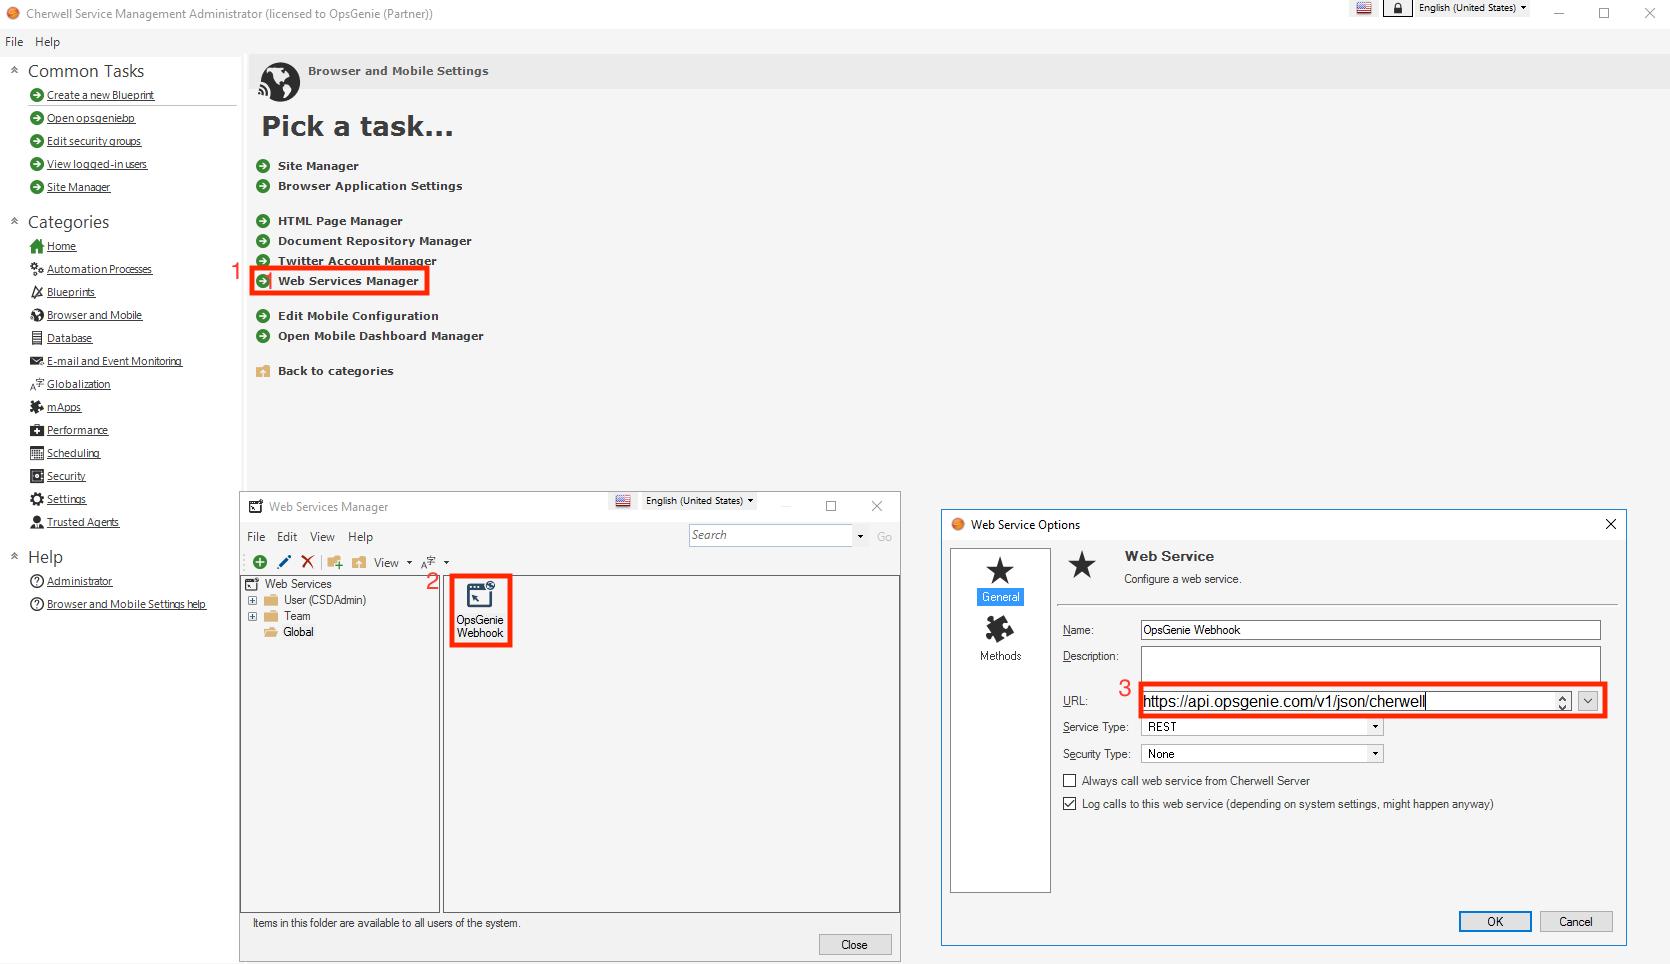 Cherwell integration change the url field from httpsapiopsgeniev1jsoncherwell to httpsapiopsgeniev1jsoncherwell malvernweather Images